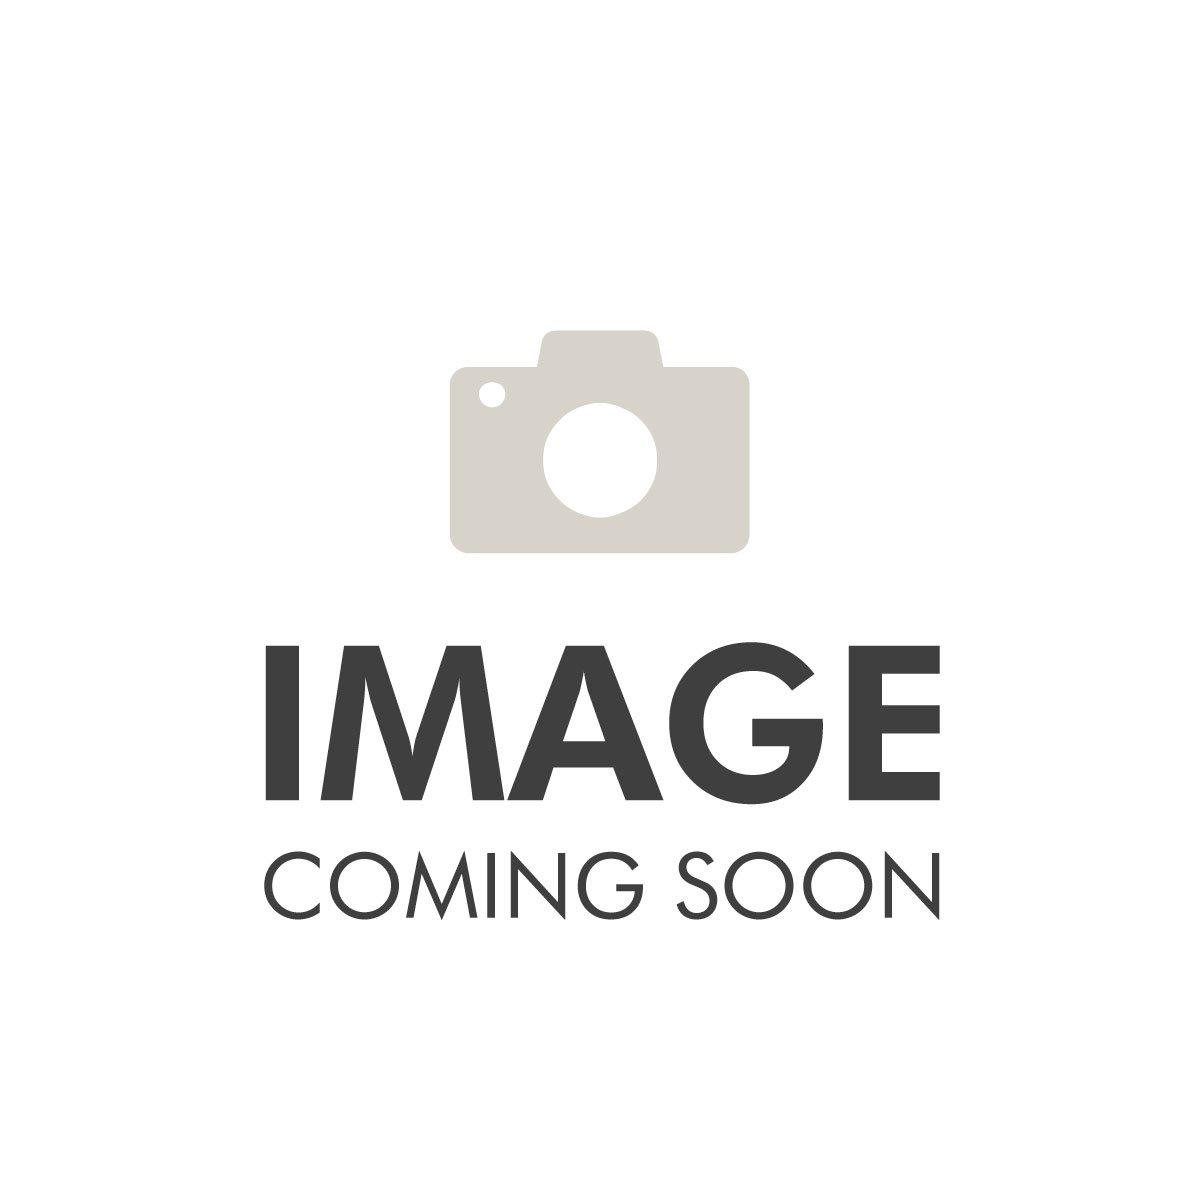 L'Oreal Loreal Revitalift Day Cream 50ml